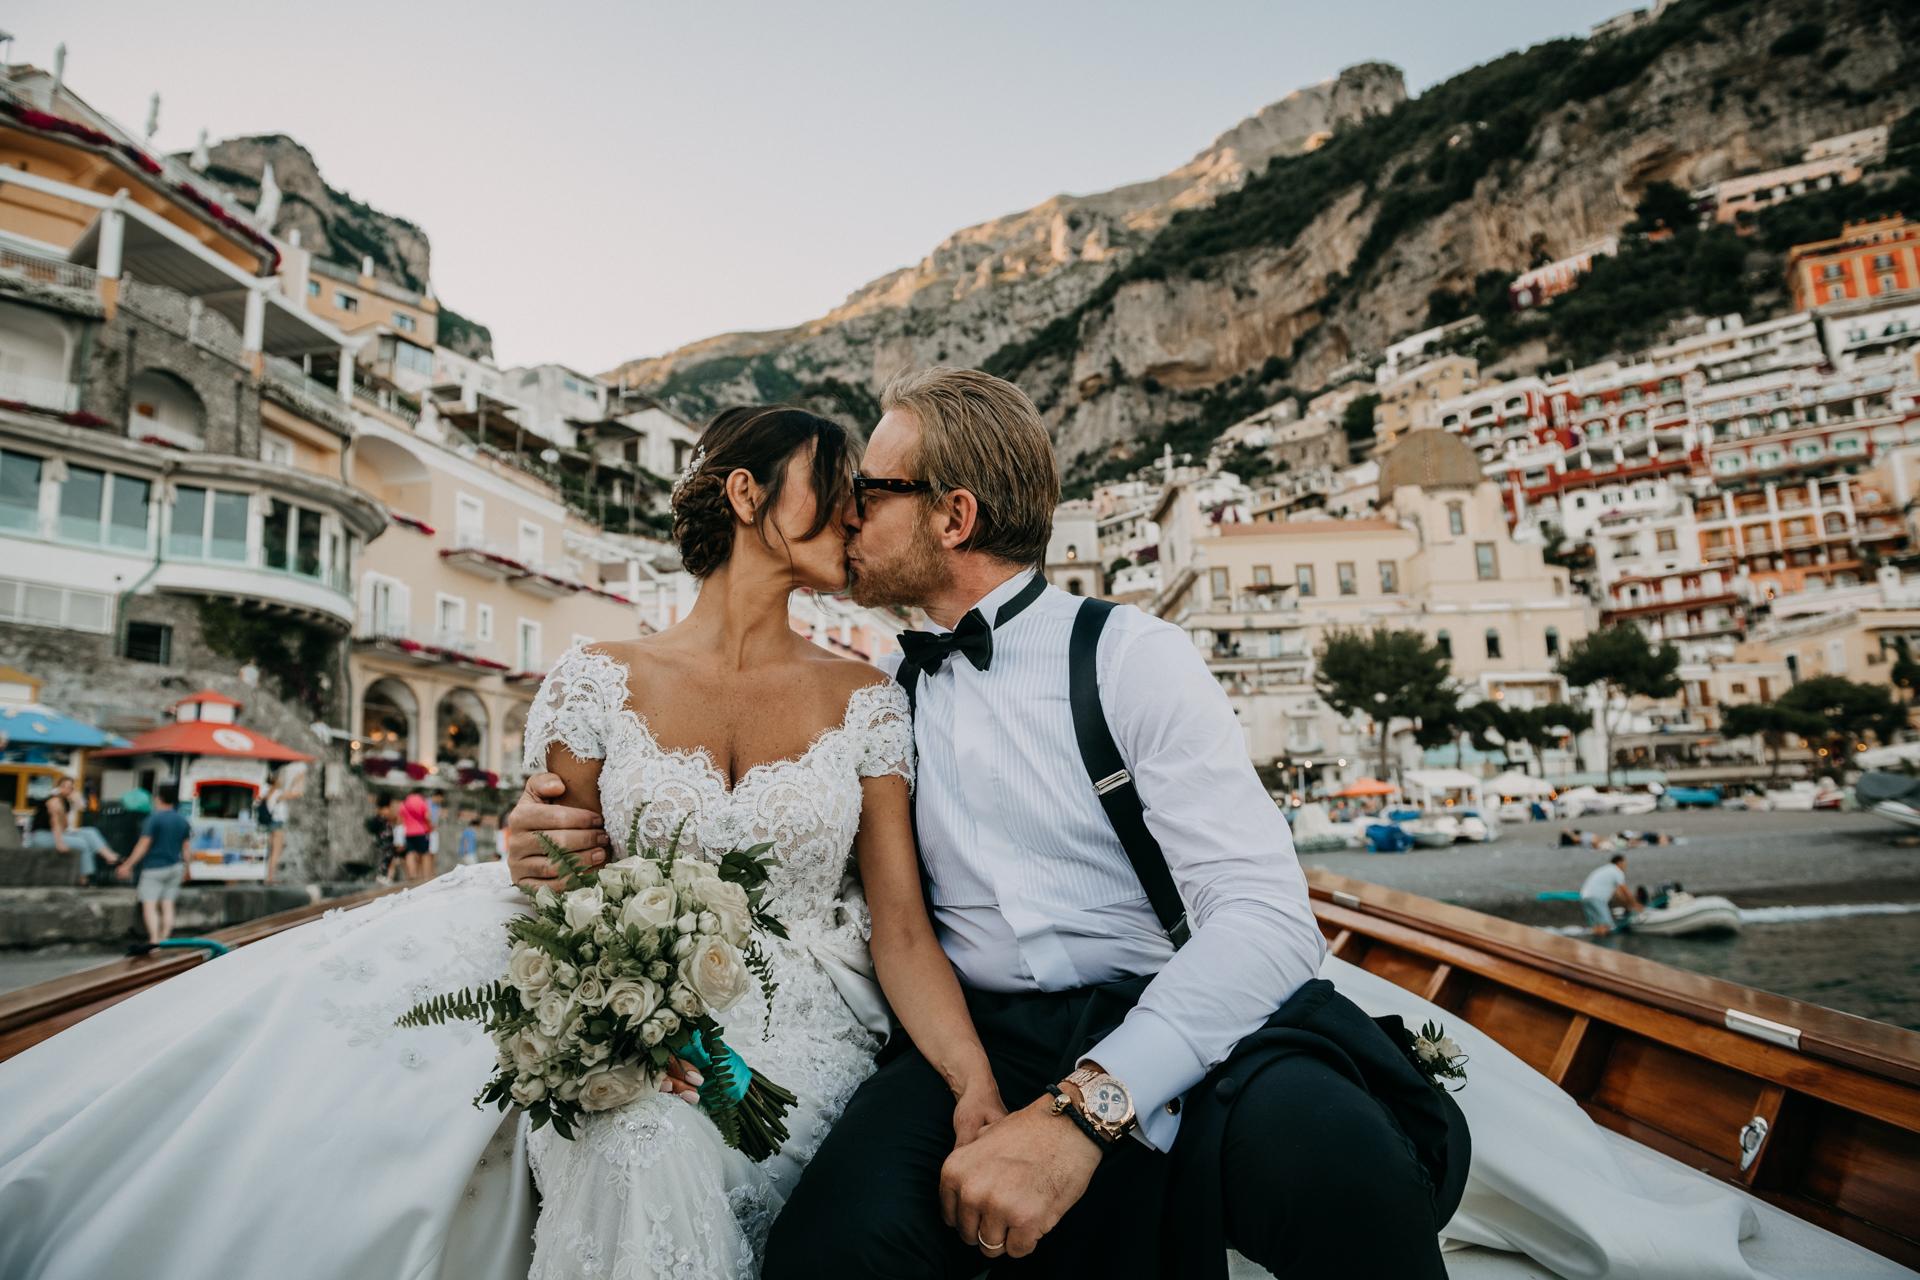 Wedding in Positano Marco Cipriano e Susanna Petrone